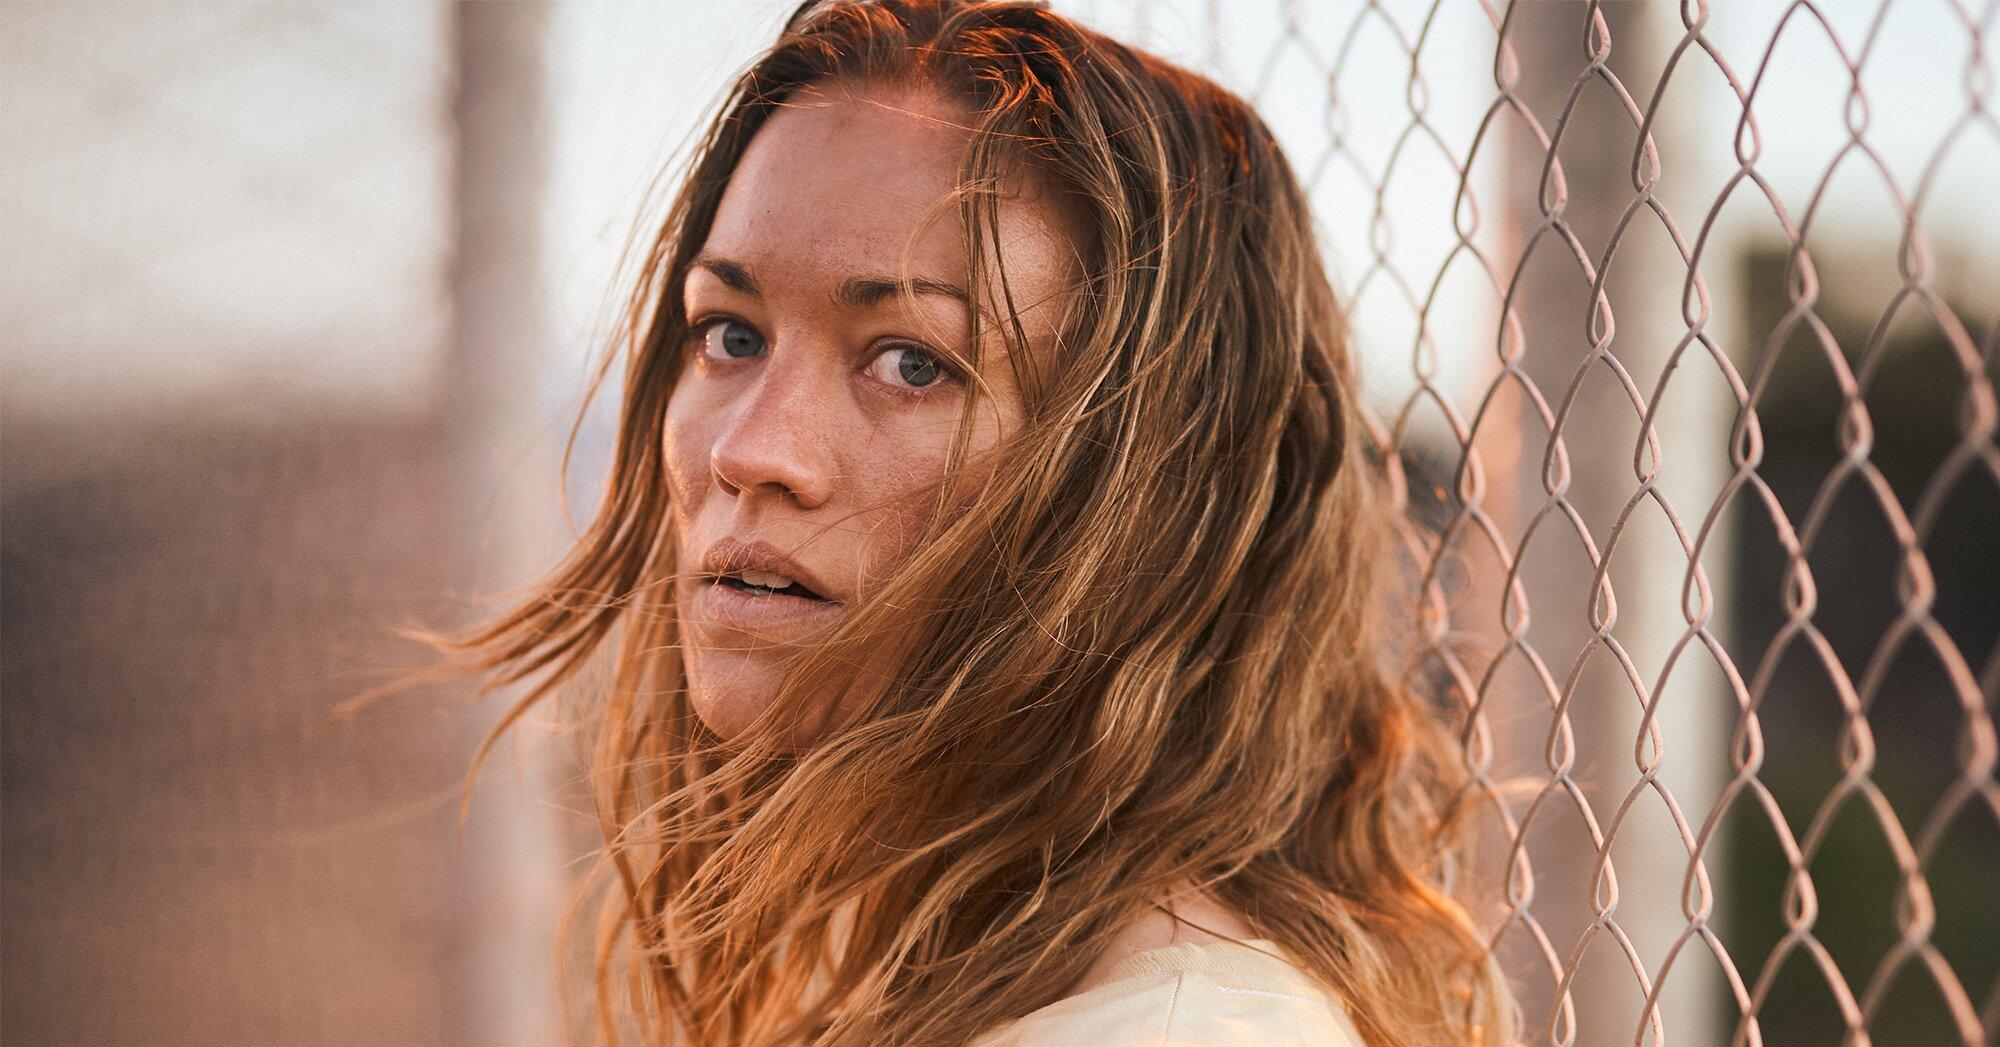 Yvonne Strahovski stuns in Netflix's detention drama 'Stateless'